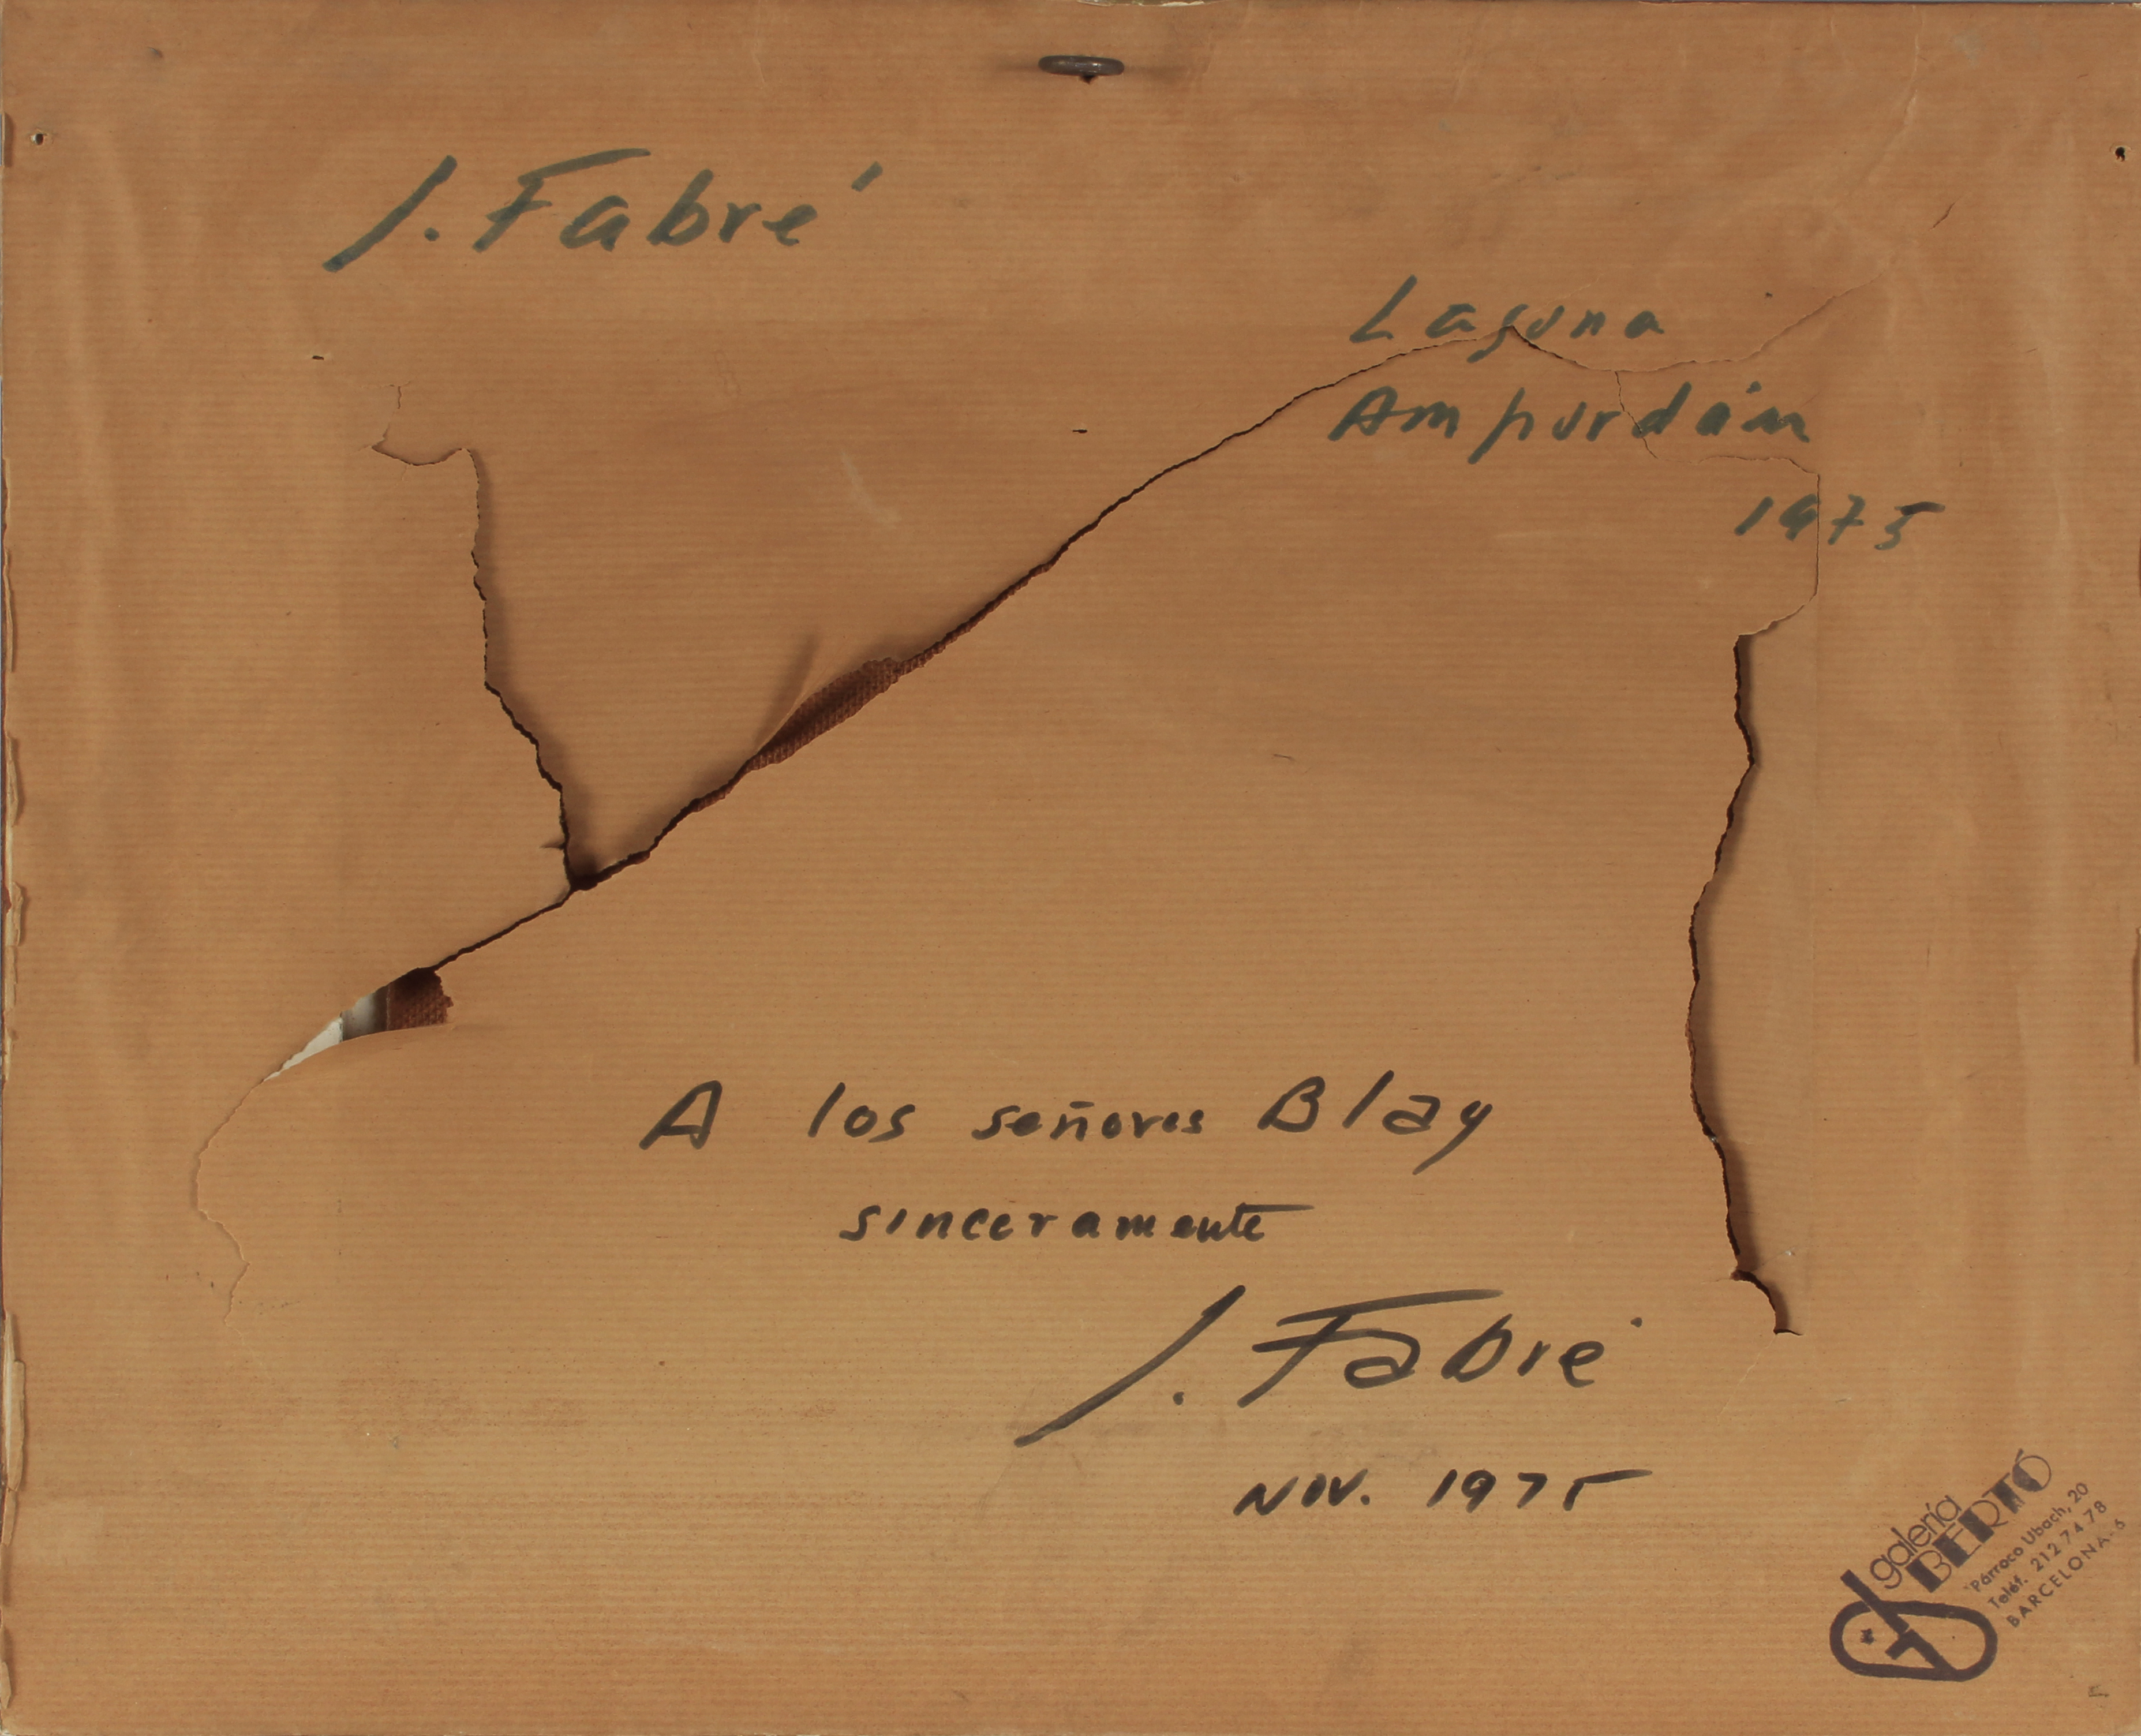 Jordi Fabré - Image 3 of 3